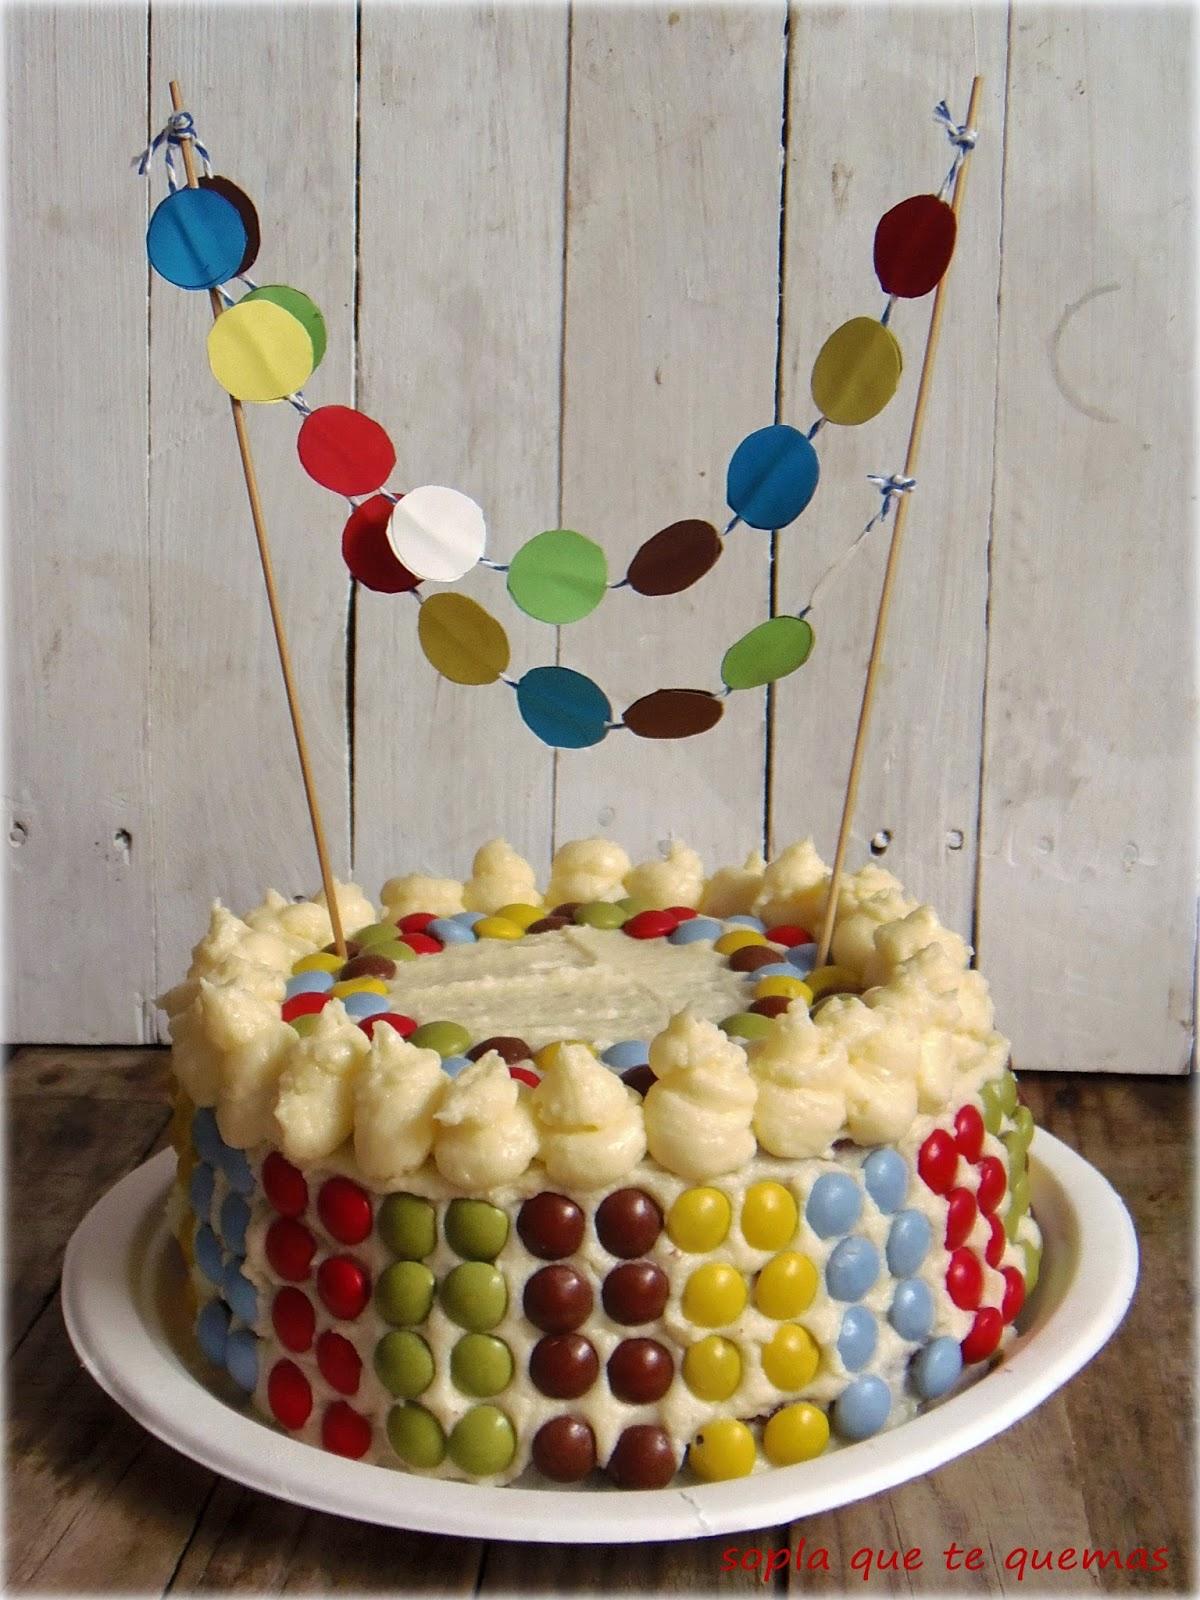 Decorar Tartas De Cumpleanos Para Ninos - Como-decorar-una-tarta-de-cumpleaos-para-nios